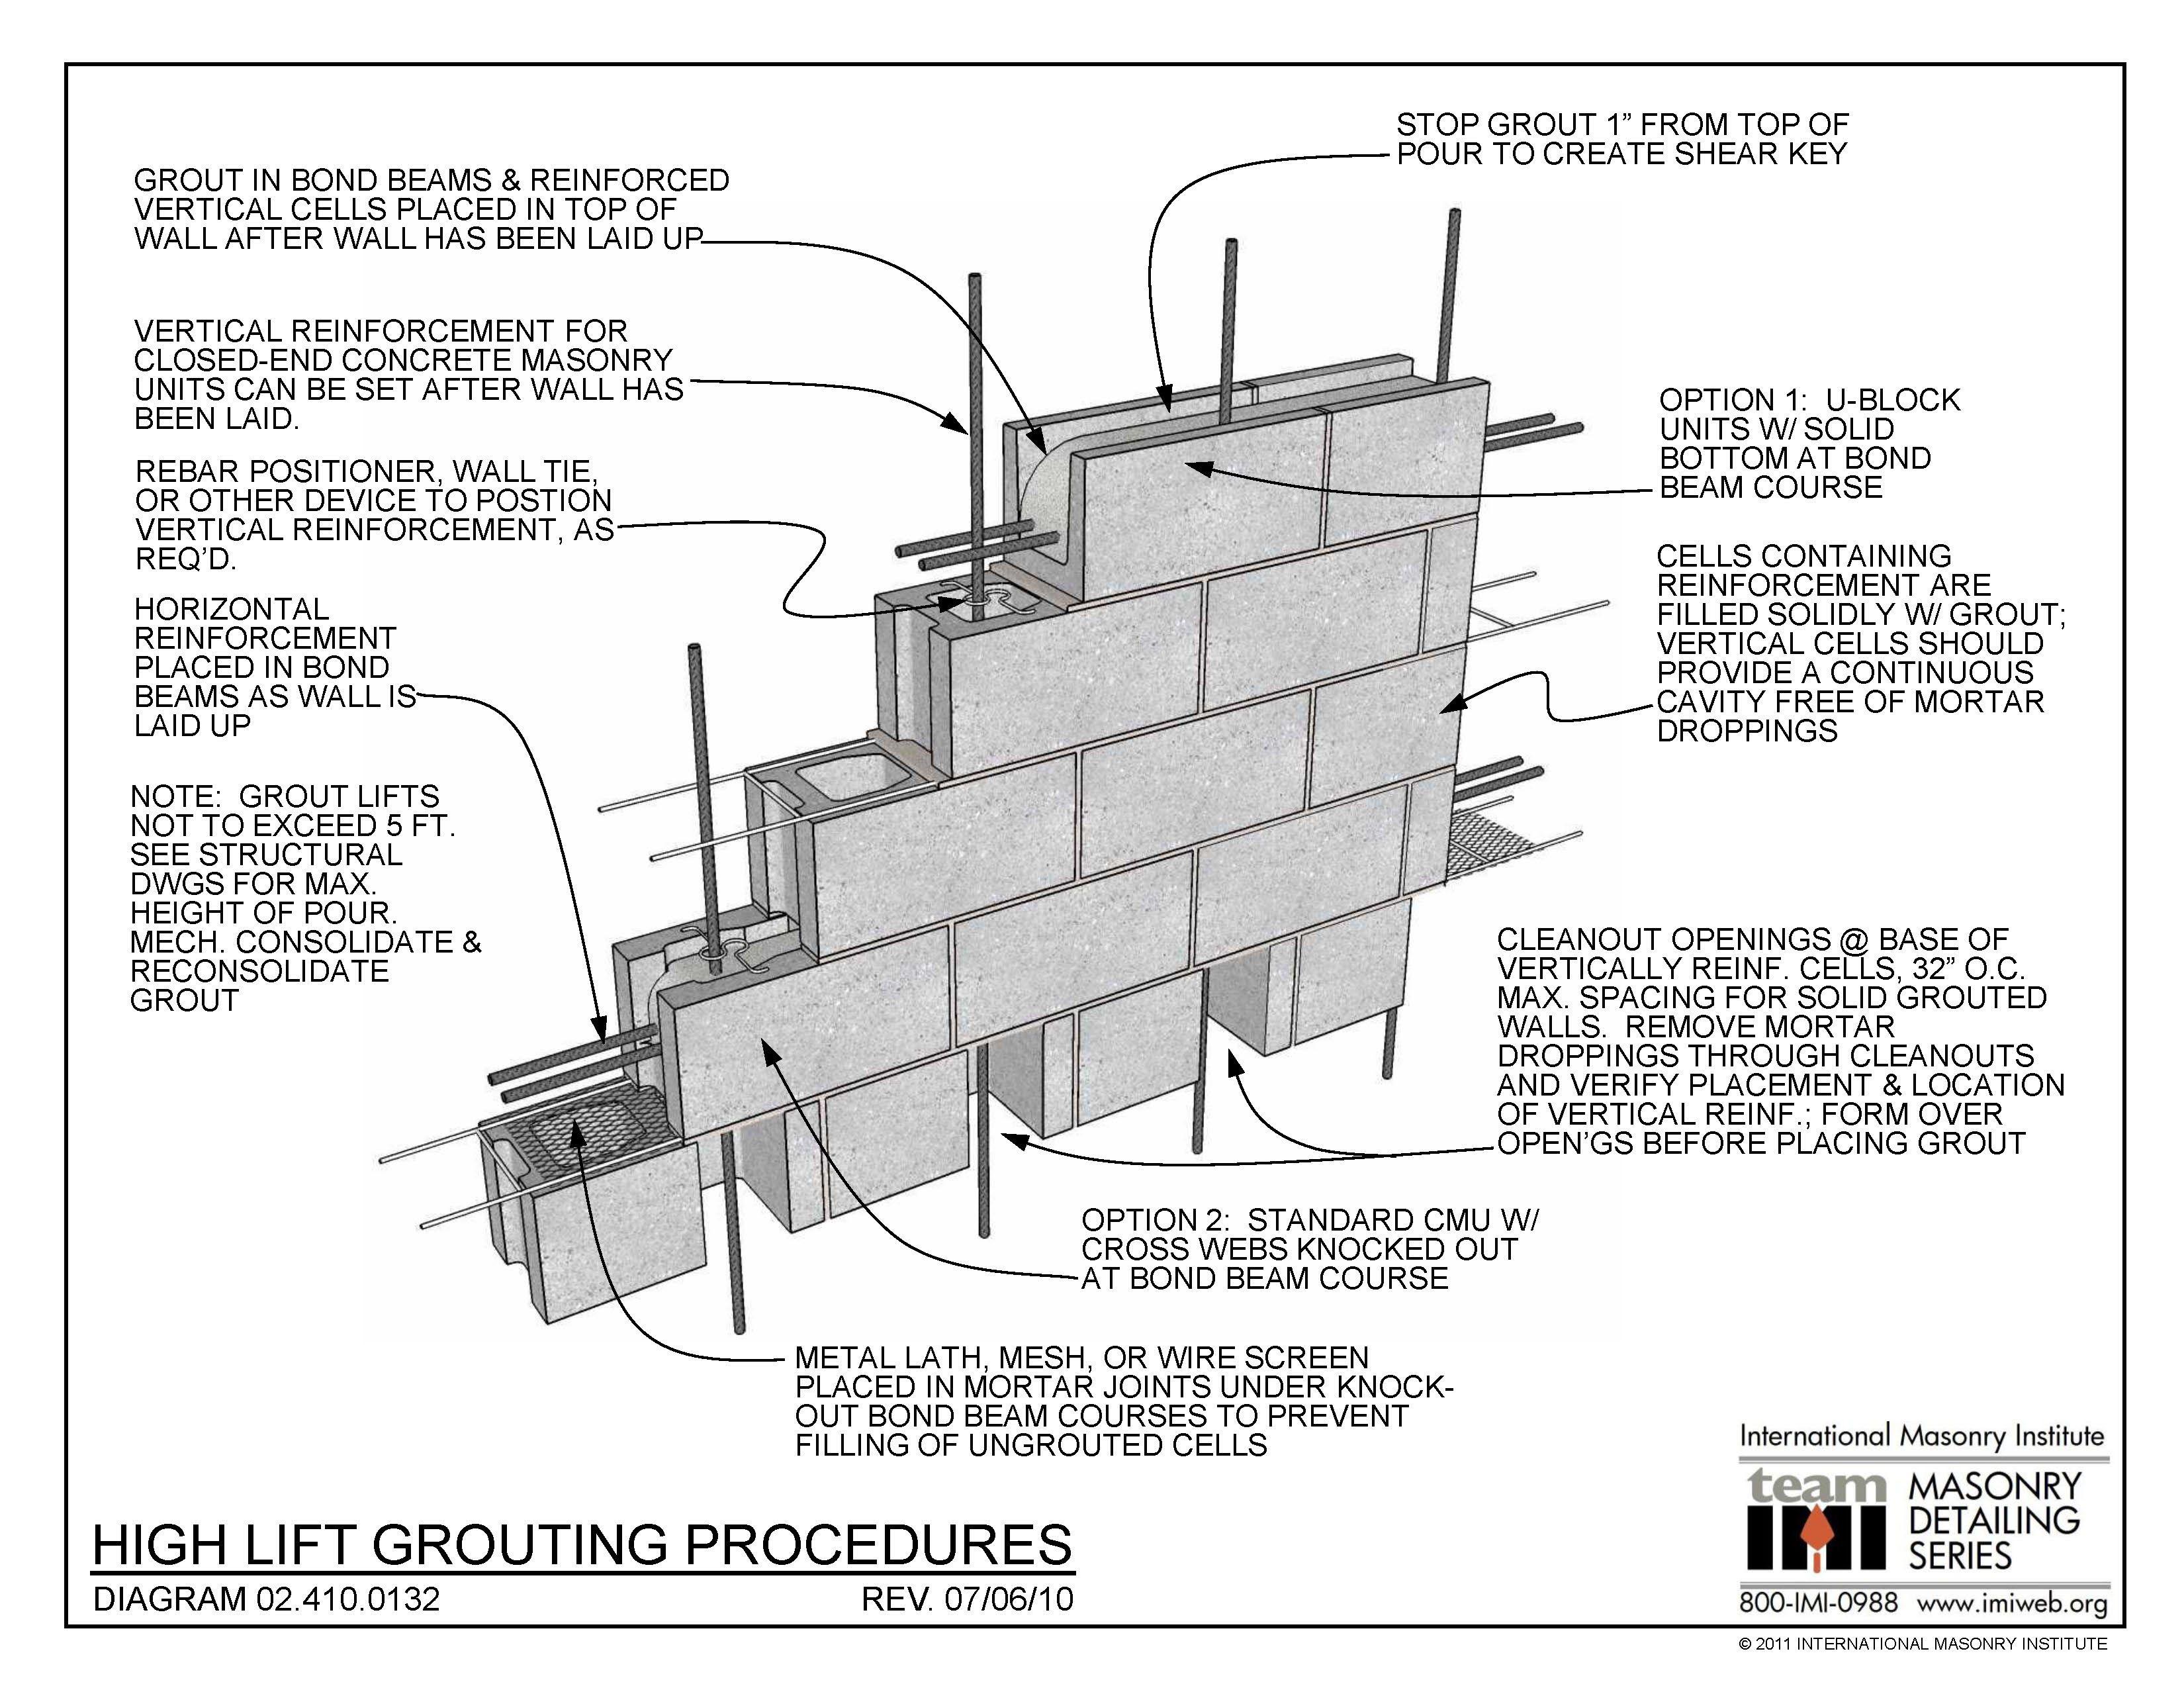 medium resolution of 02 410 0132 high lift grouting procedures international masonry institute construction drawings masonry